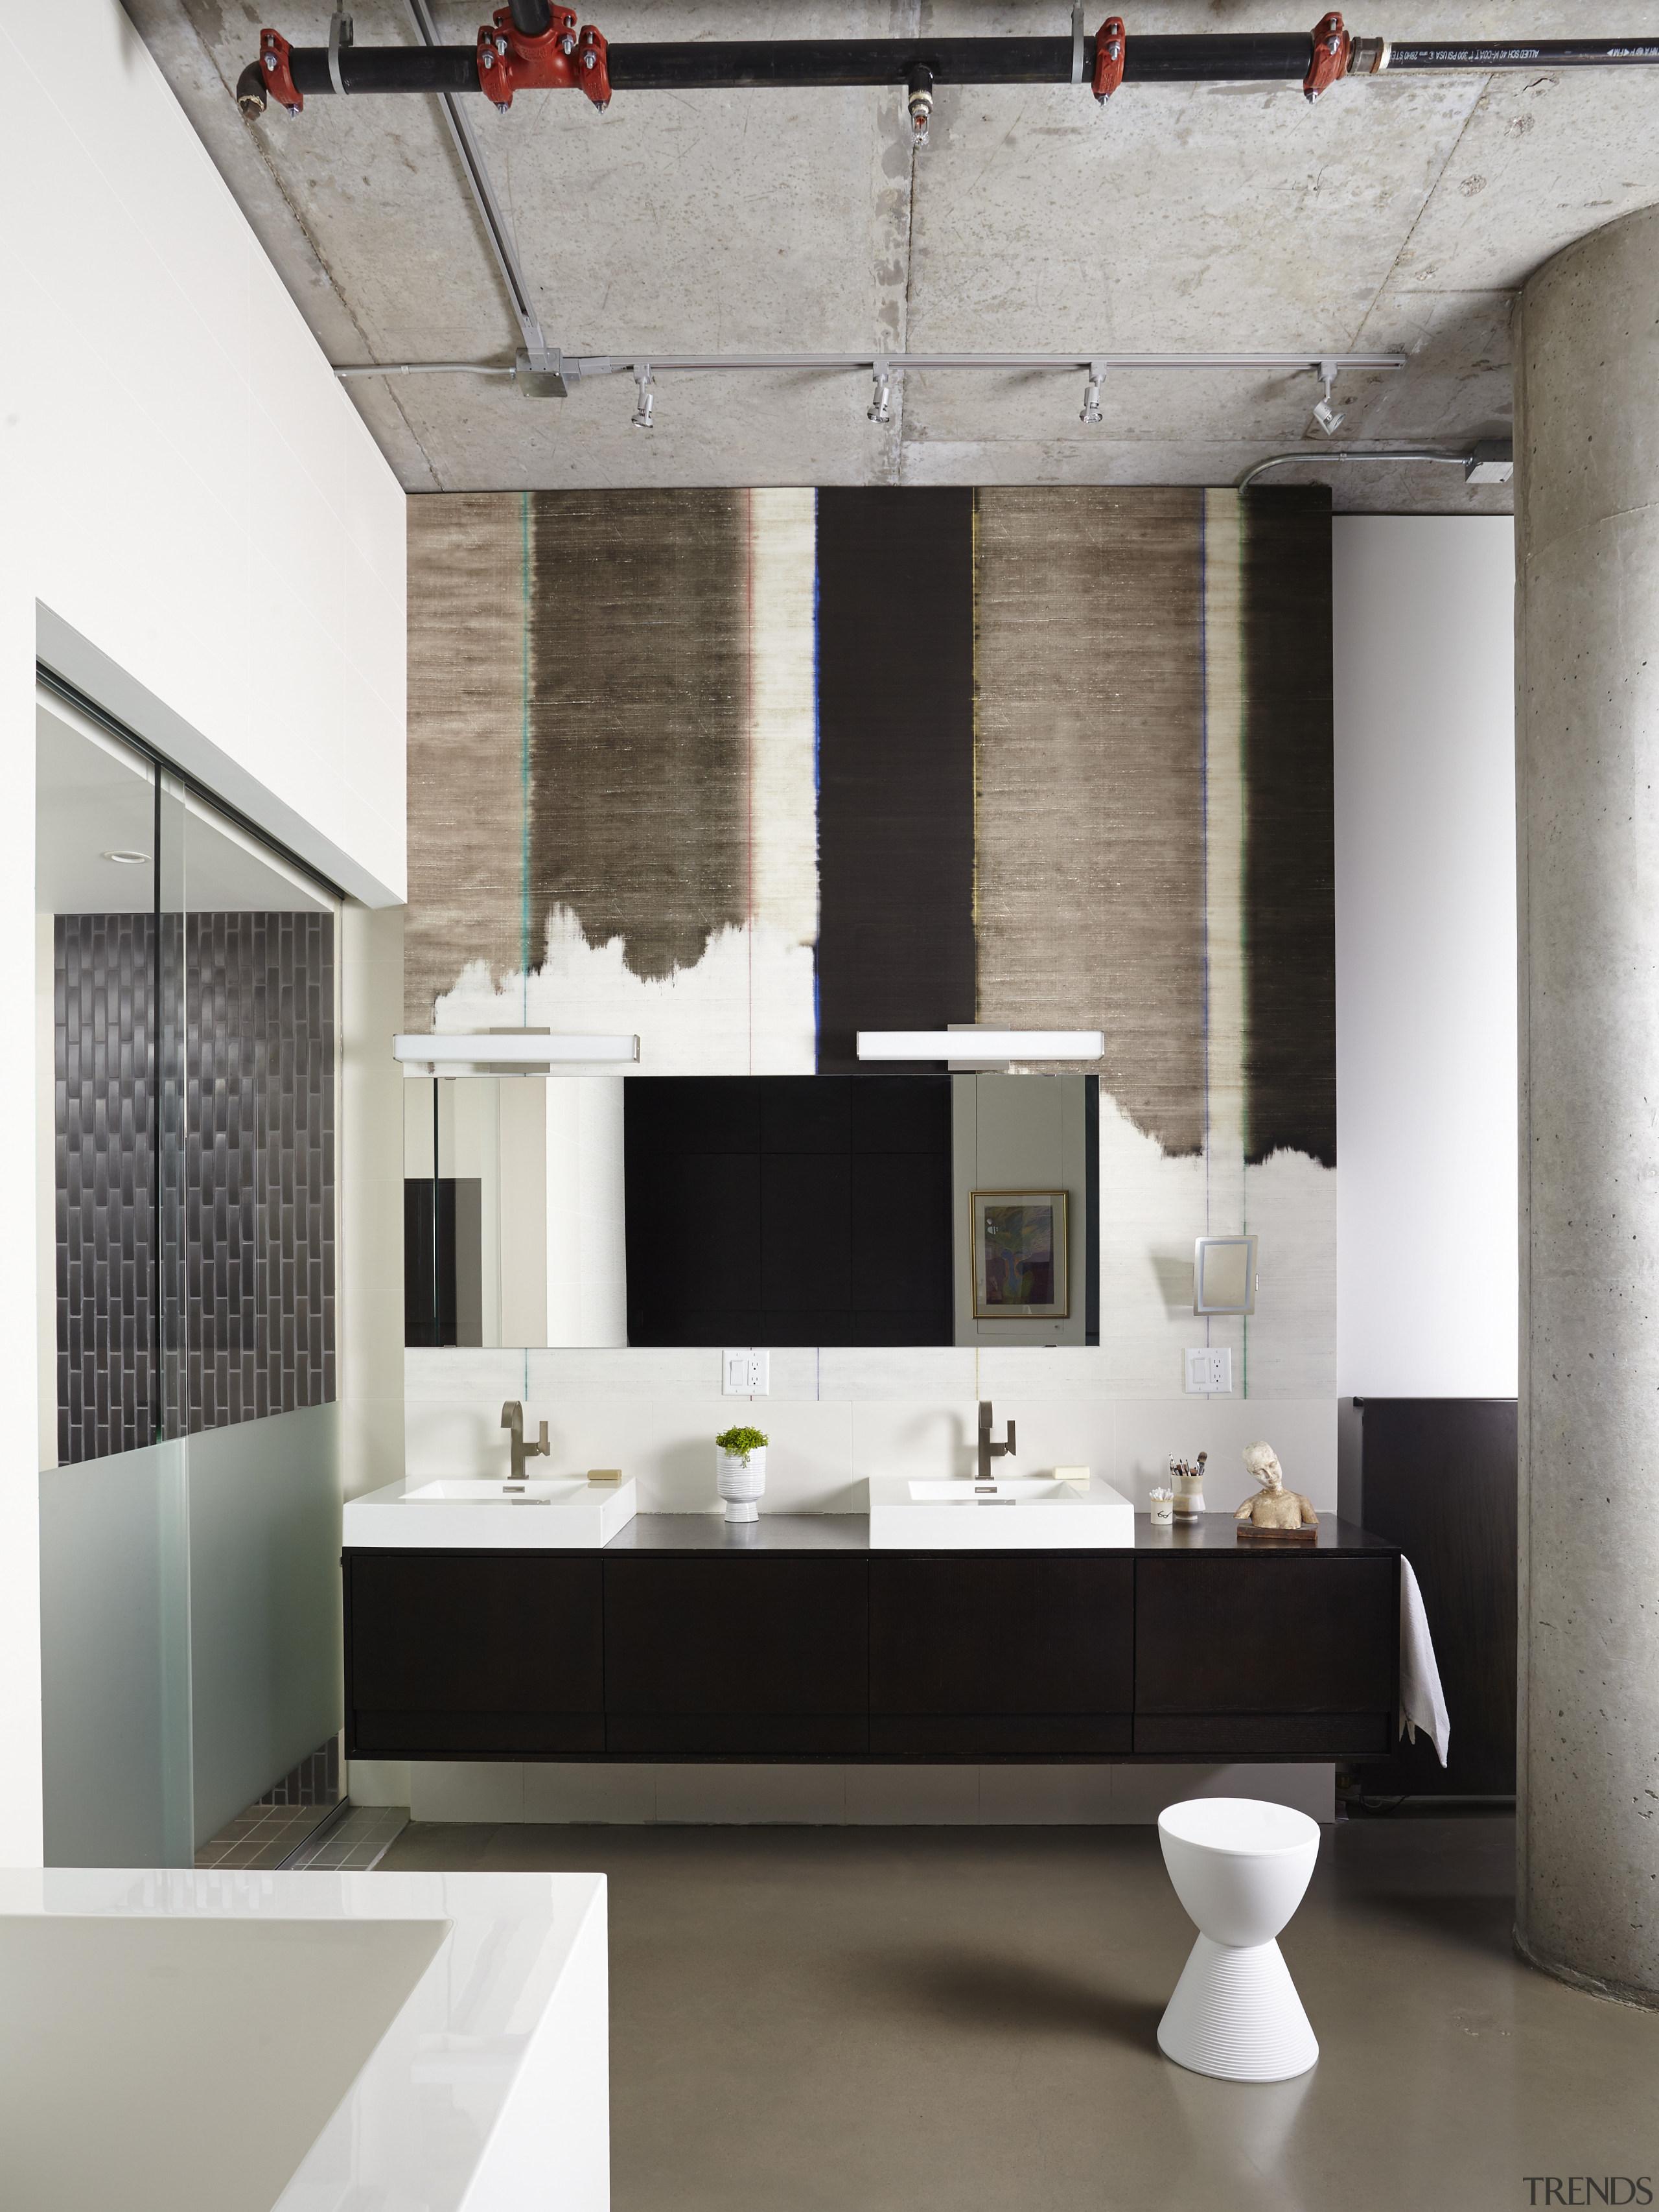 Designer distressed wallpaper hung behind the vanity brings floor, flooring, furniture, interior design, living room, wall, gray